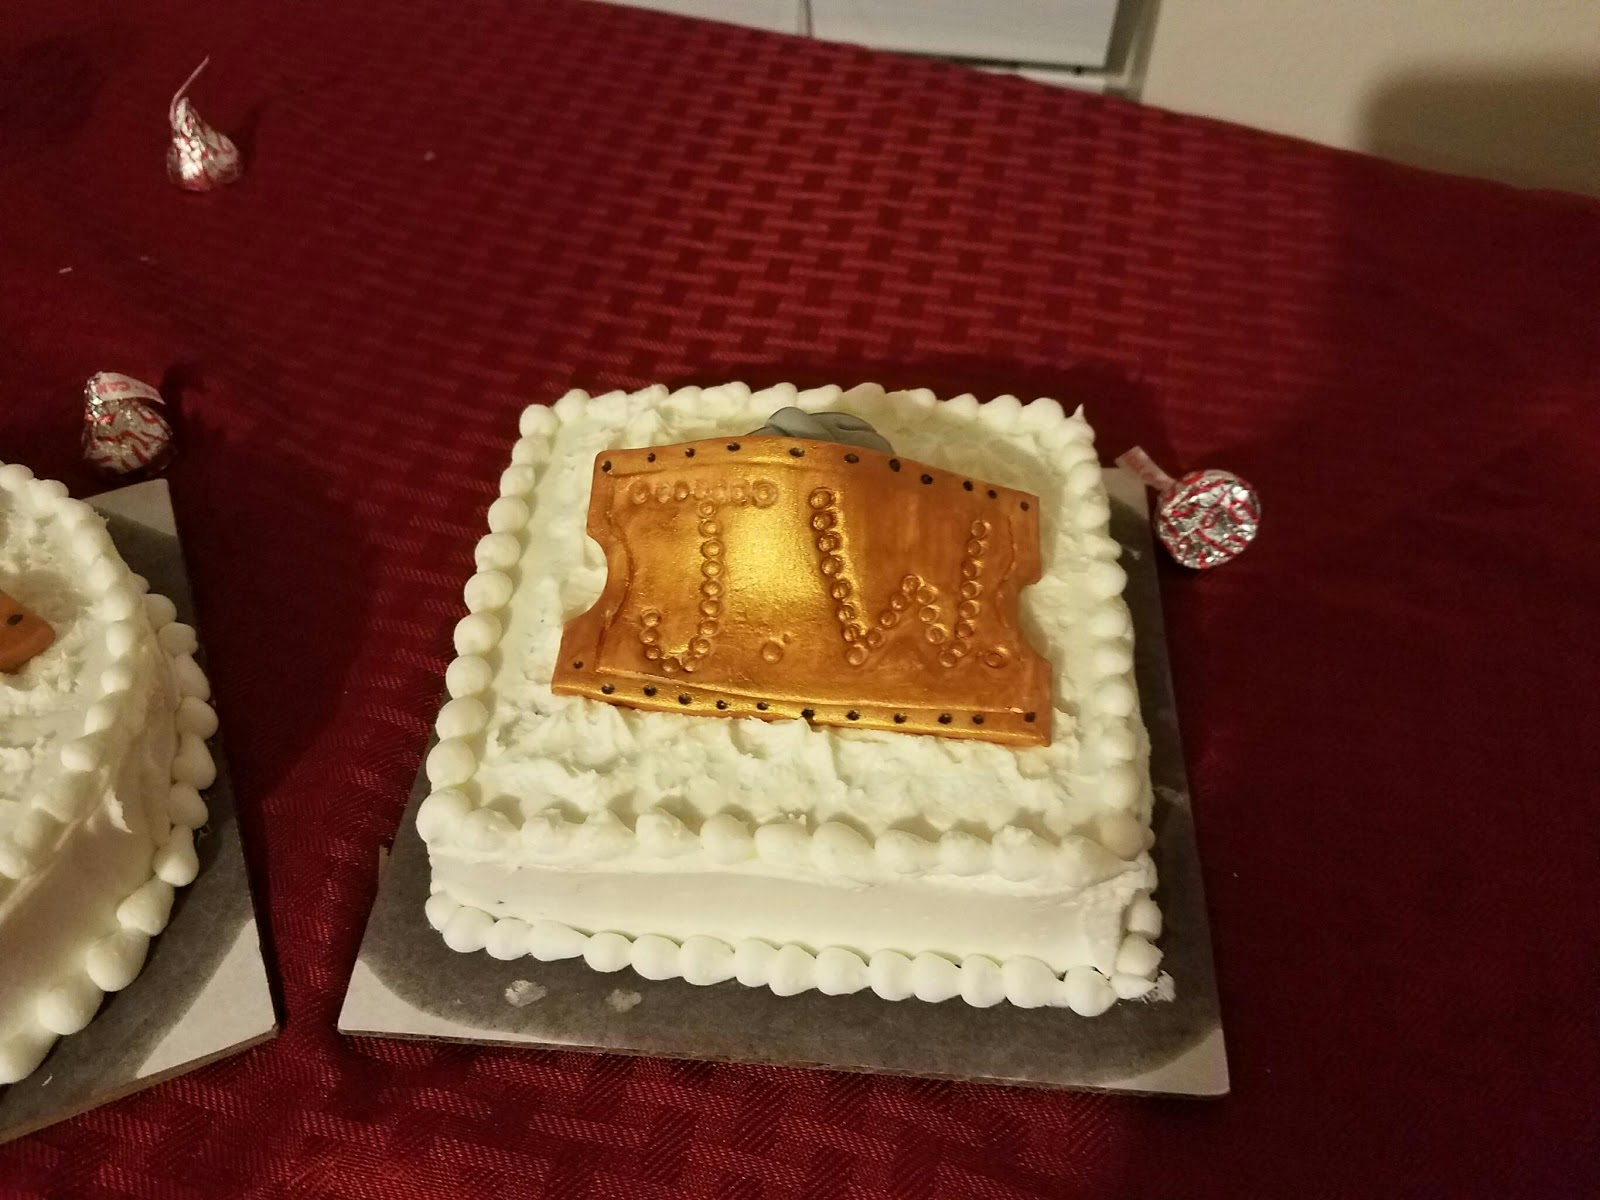 Amazing Cakes By Meg 2 Polar Express 1St Birthday Cake Funny Birthday Cards Online Fluifree Goldxyz